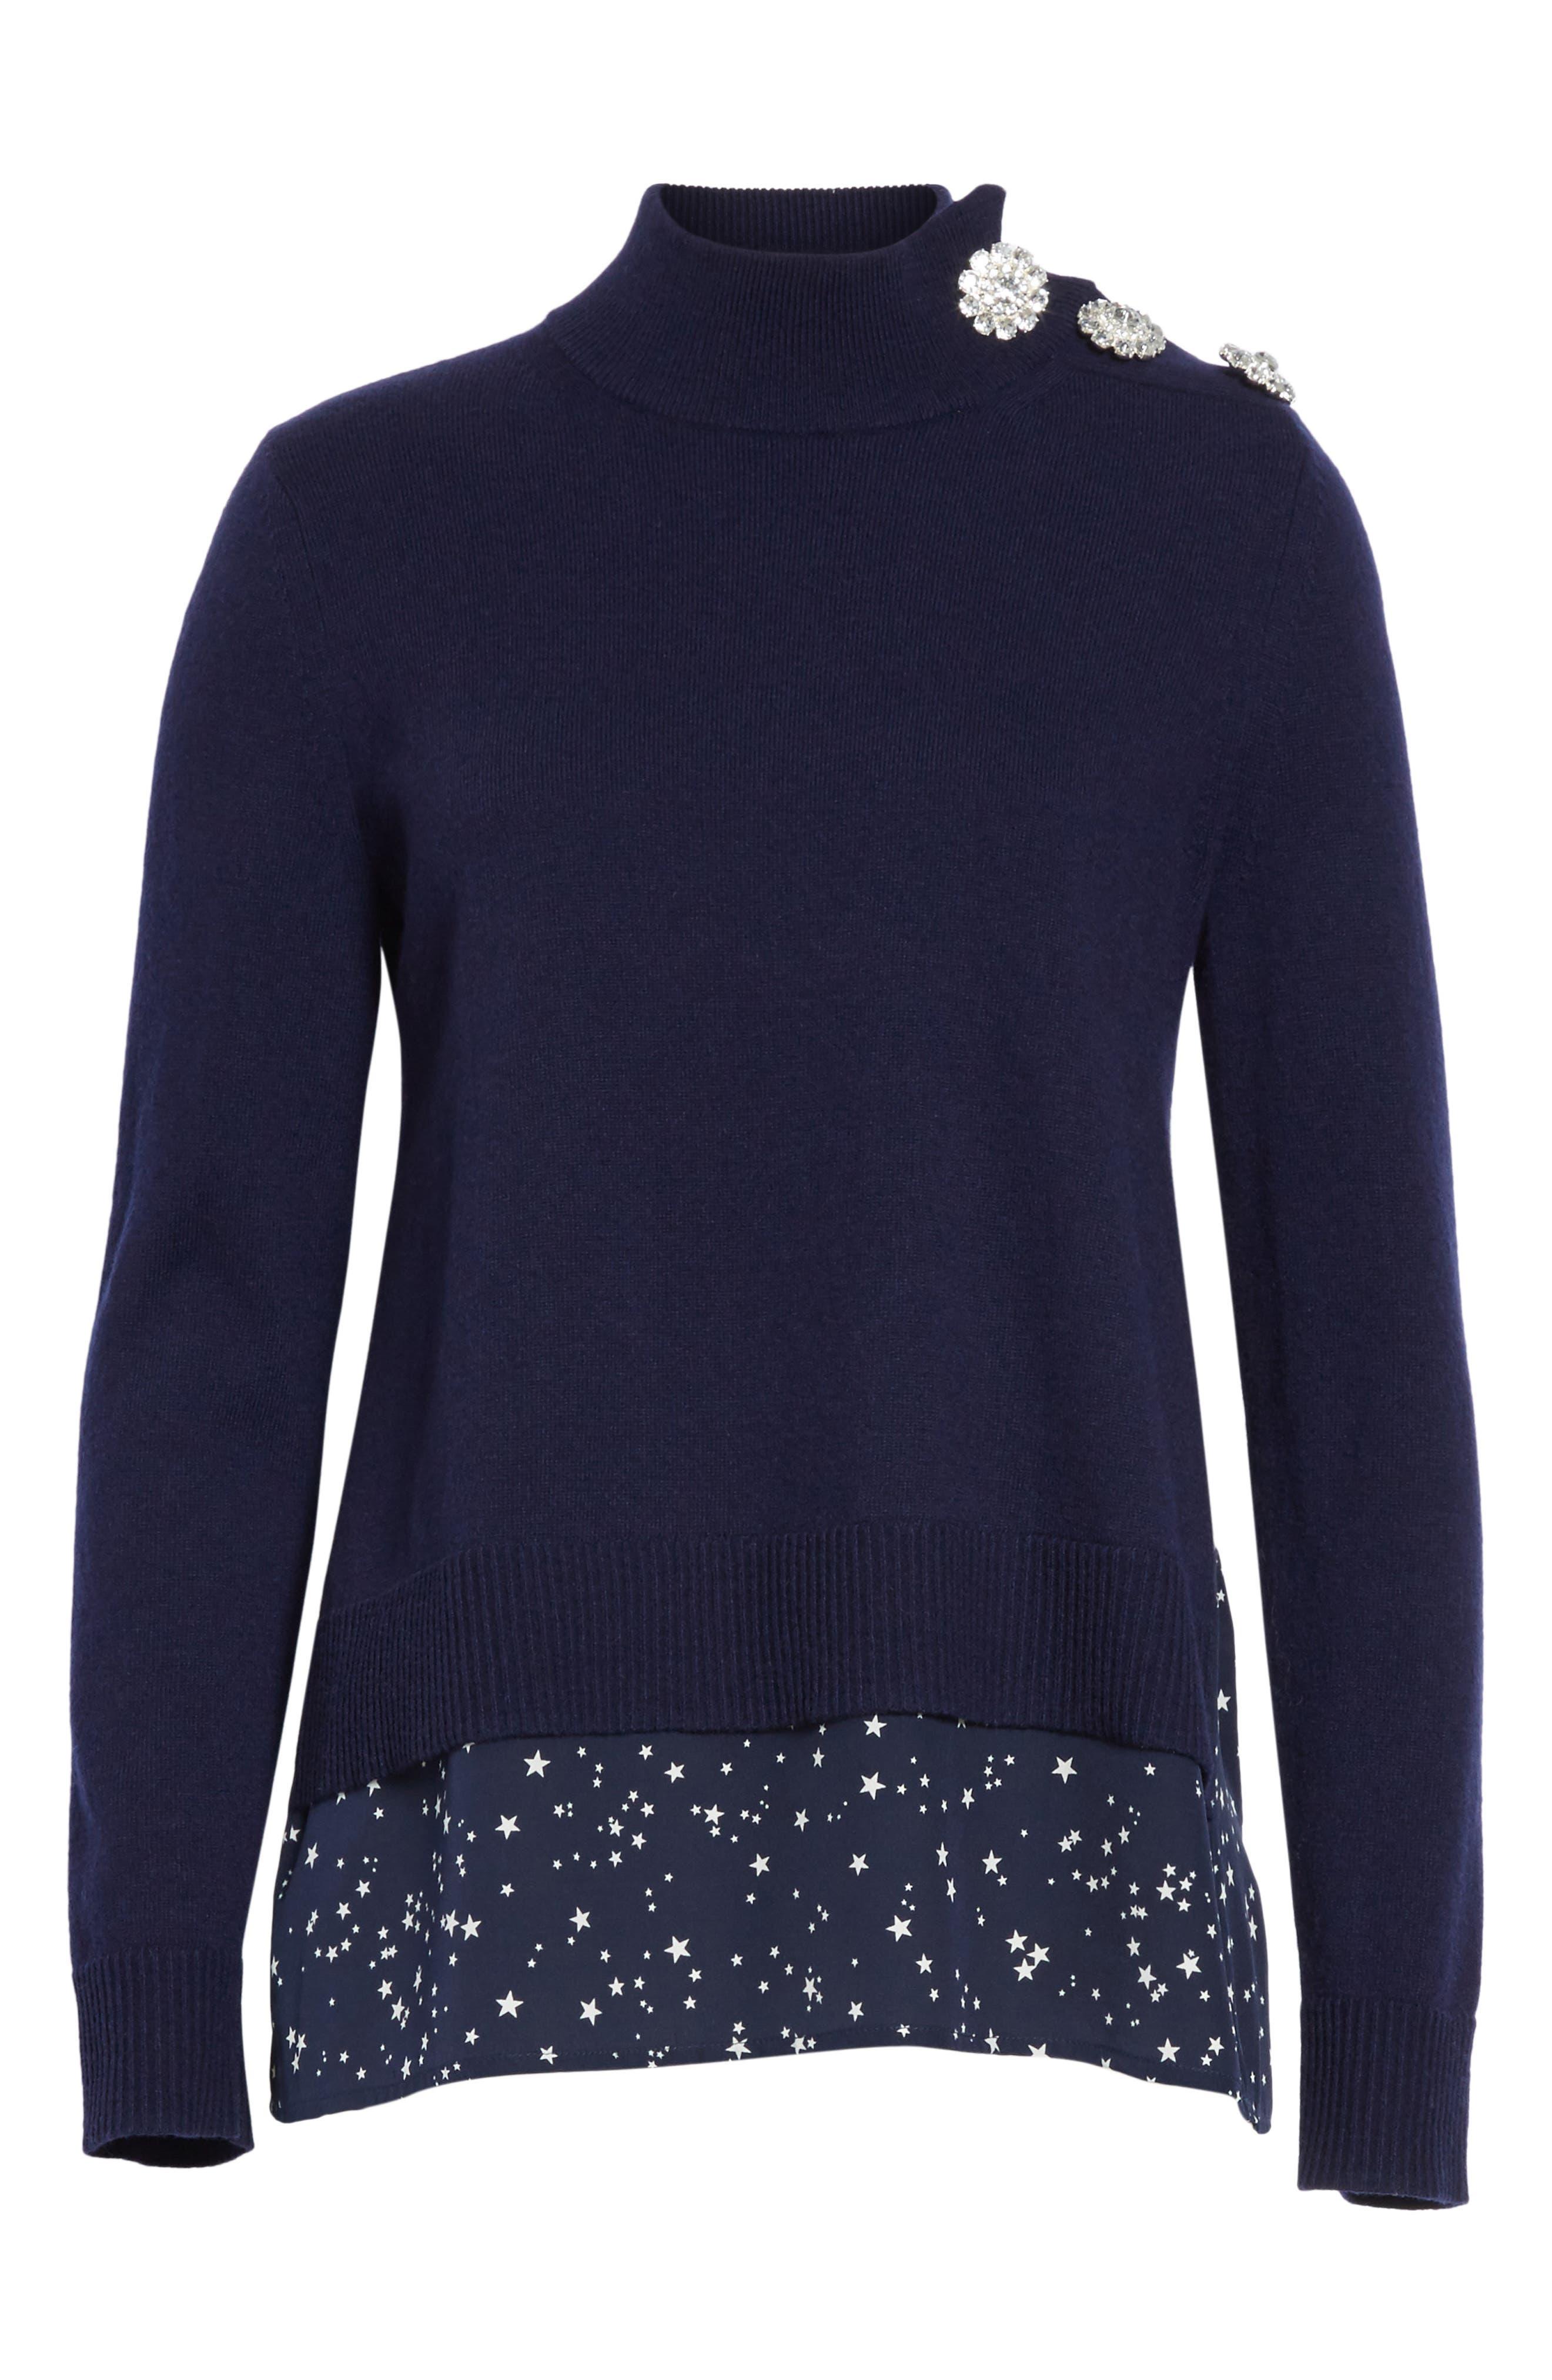 night sky mixed media sweater,                             Alternate thumbnail 6, color,                             Rich Navy